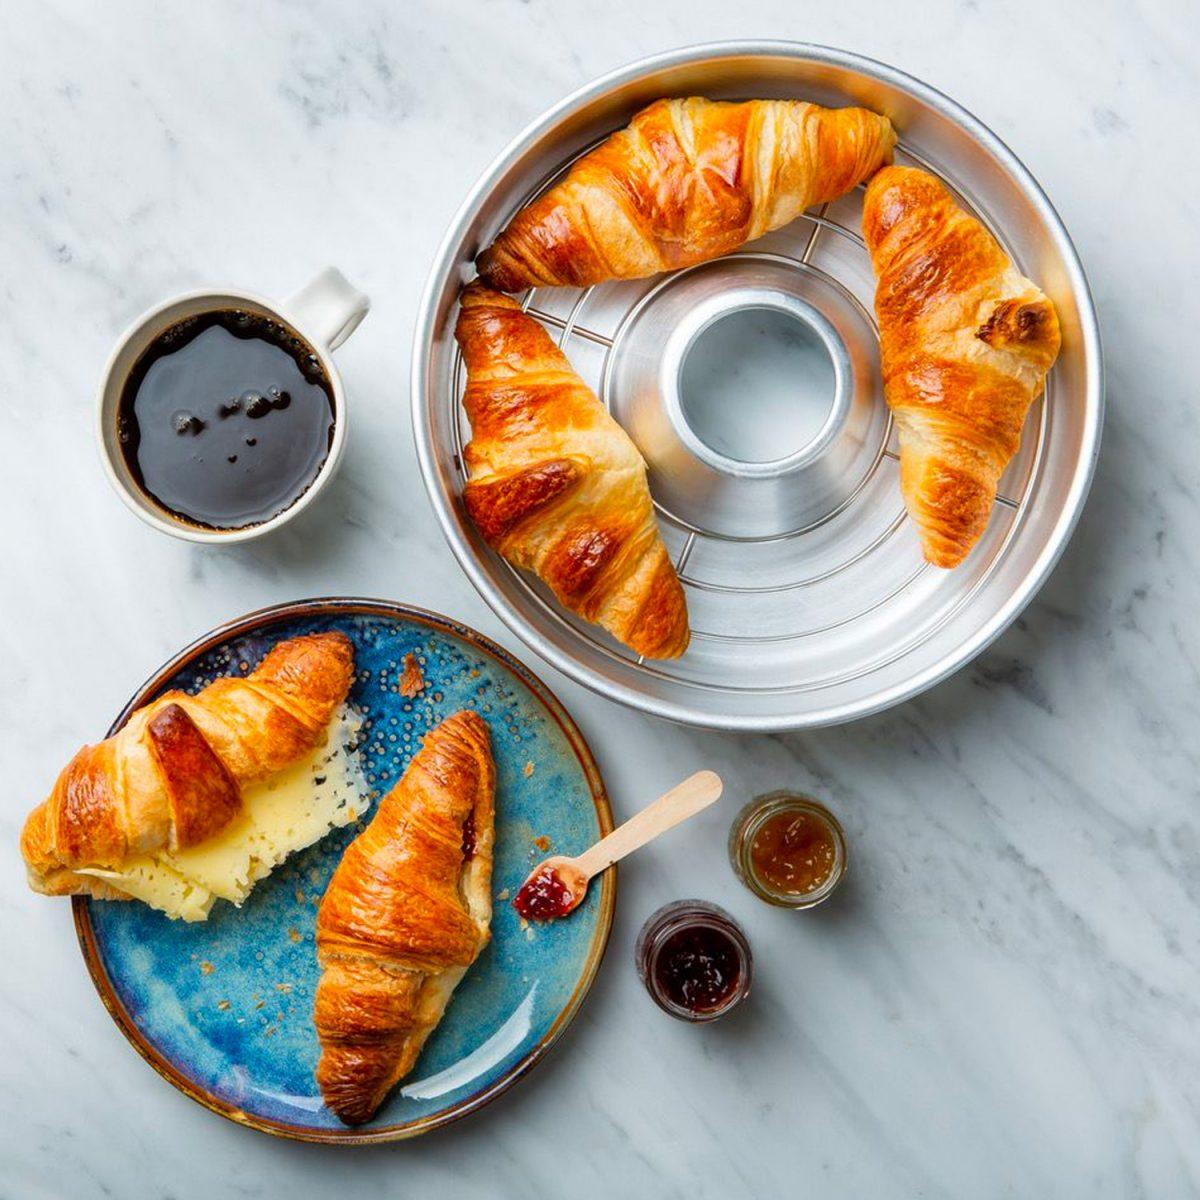 omnia oven rack croissants